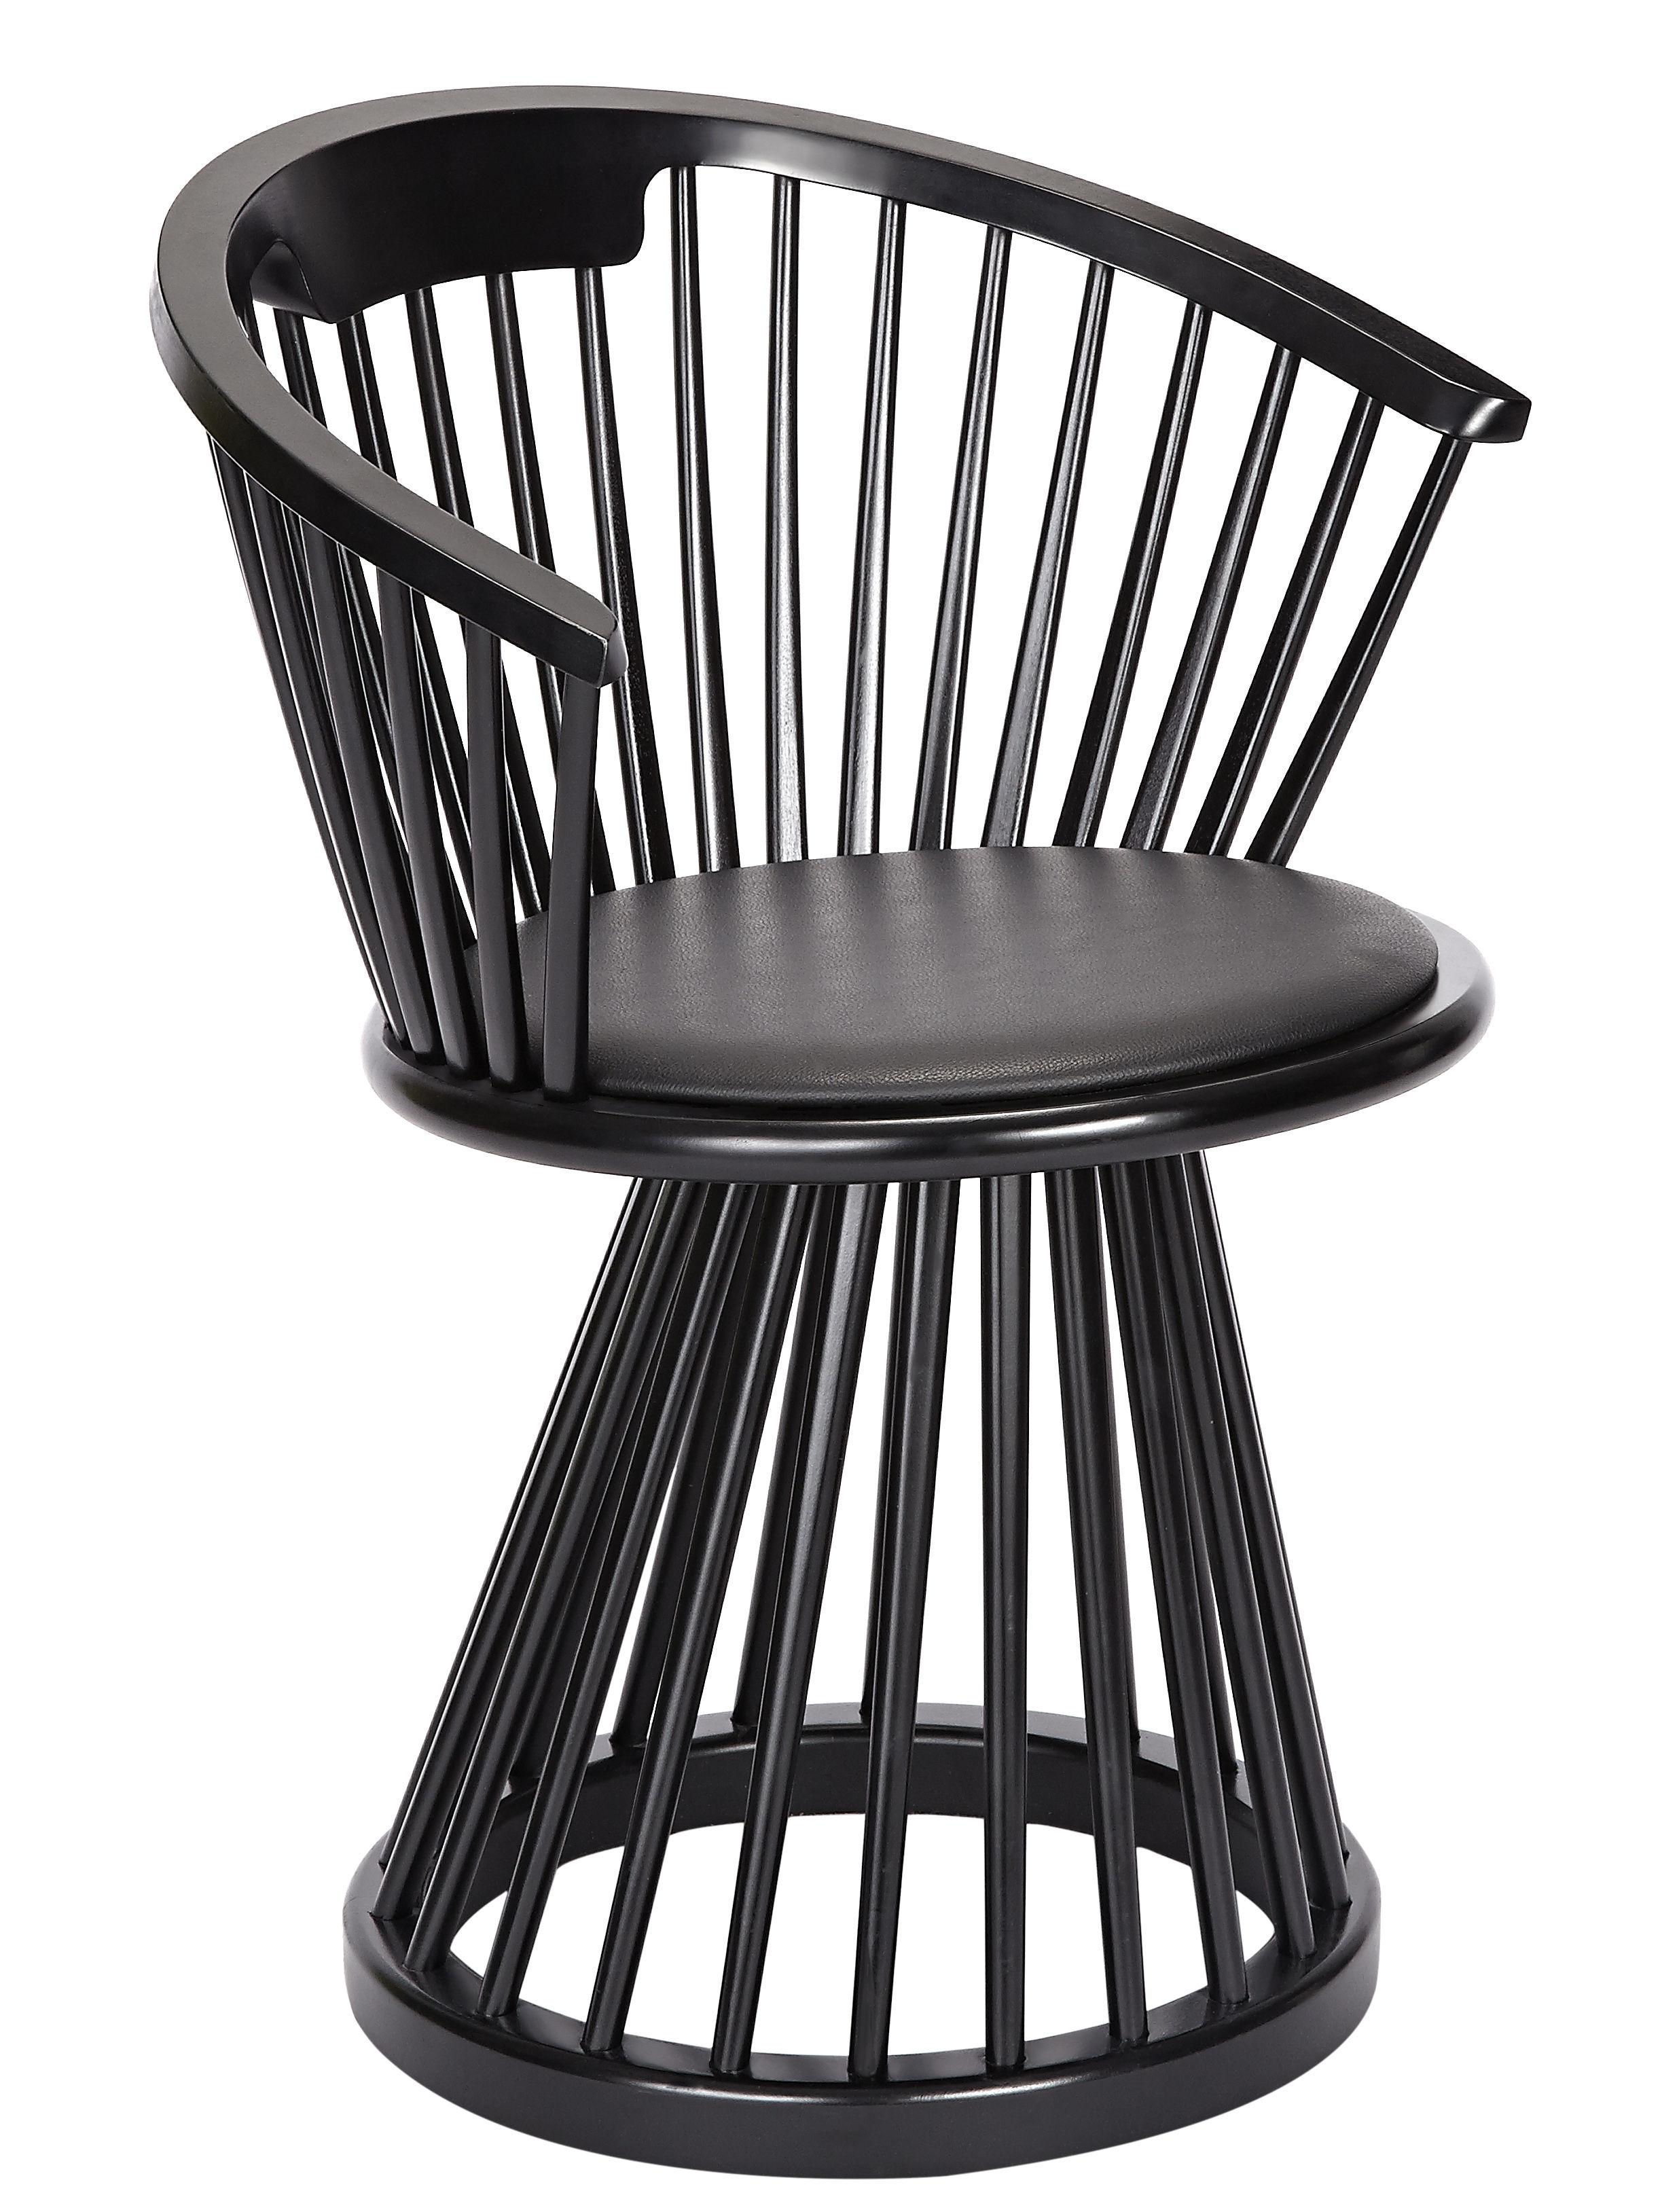 Fan Armchair - H 78 cm - Wood & leather Black / Black ...